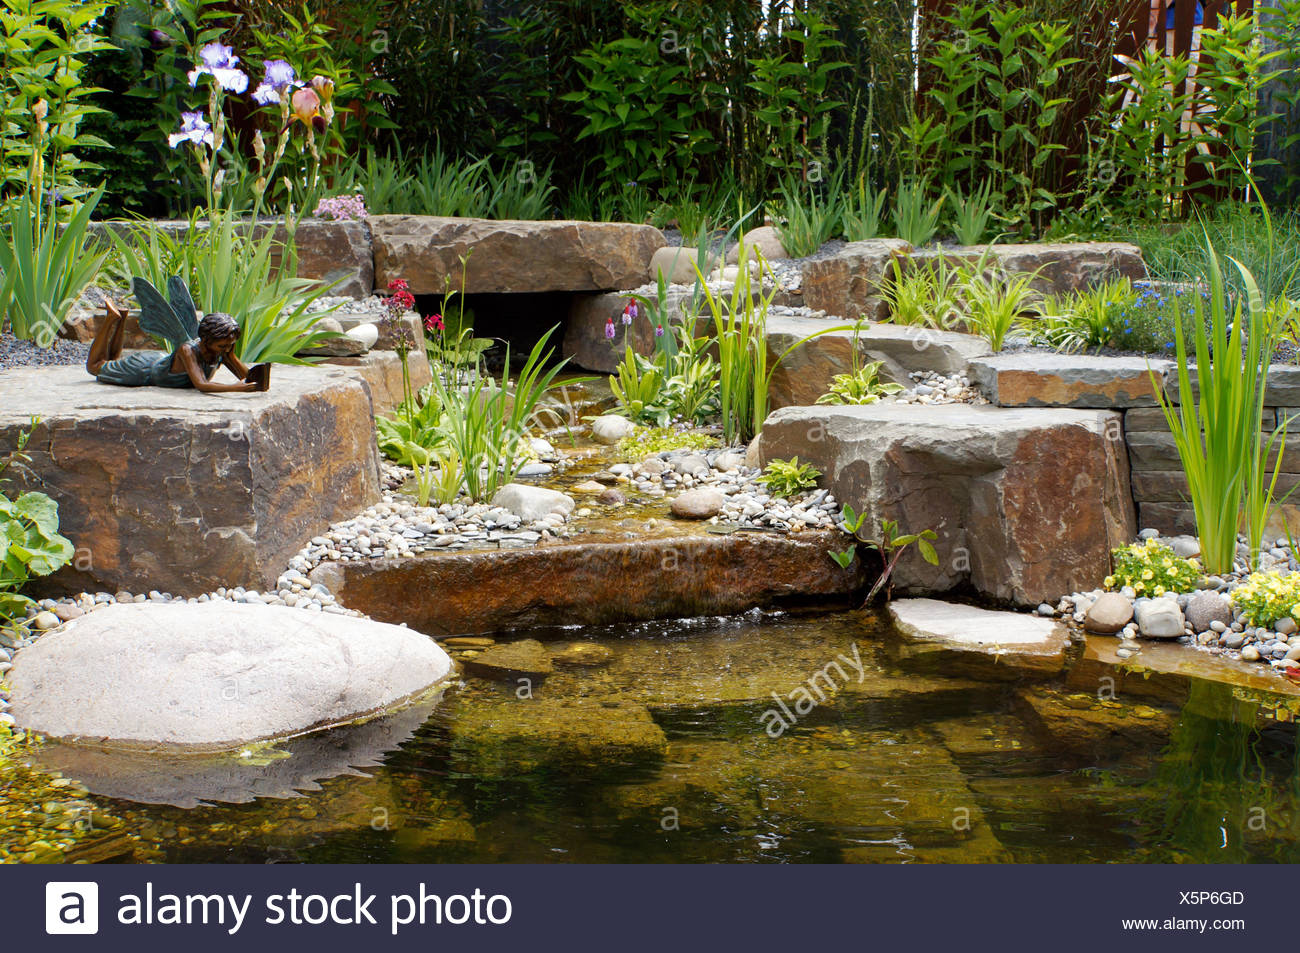 Bachlauf Garten Stock Photos & Bachlauf Garten Stock Images - Alamy